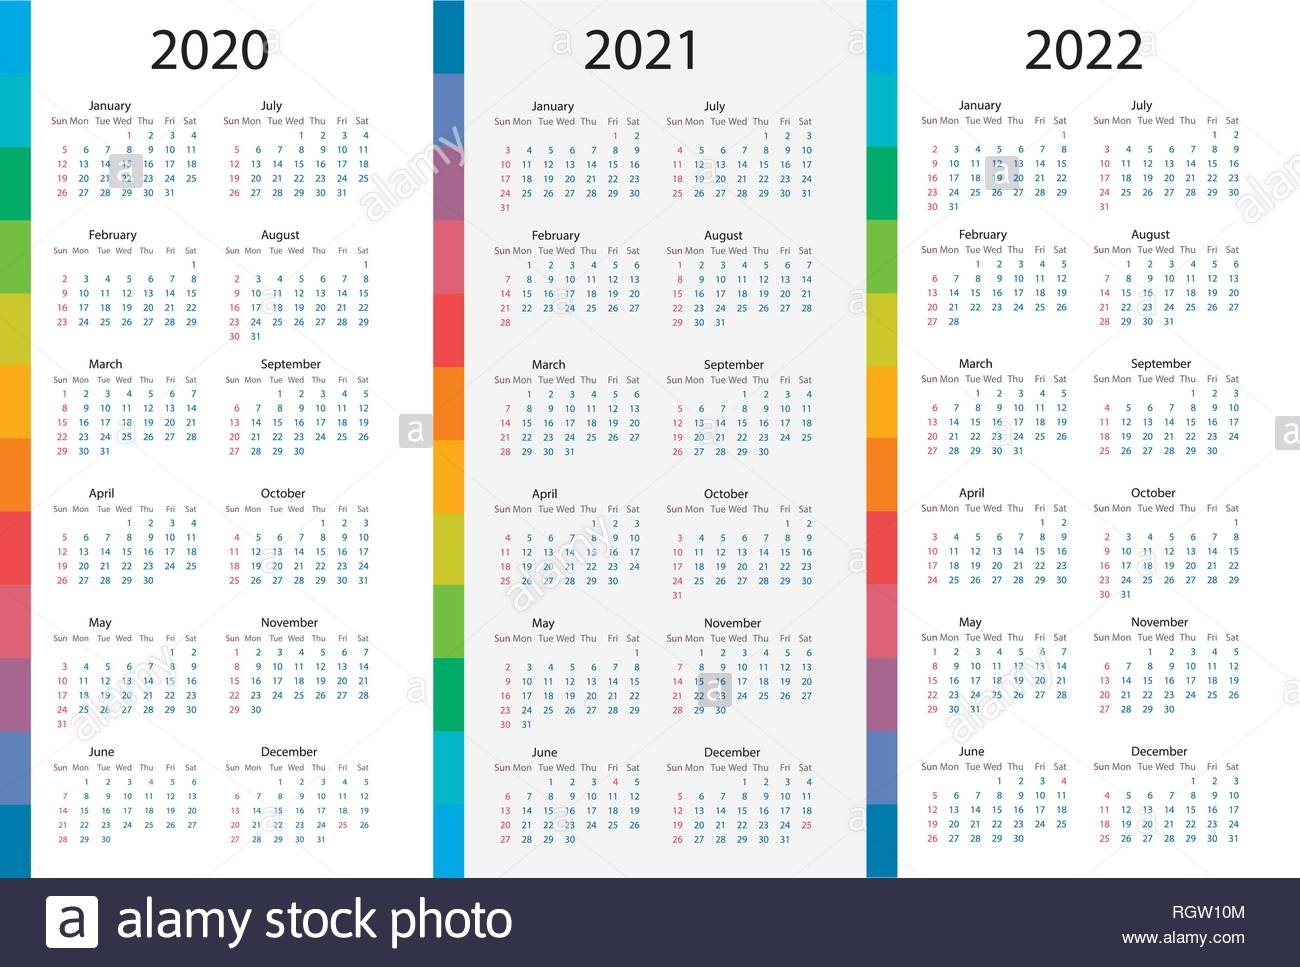 Calendar Template Set For 2020, 2021, 2022 Years. Week